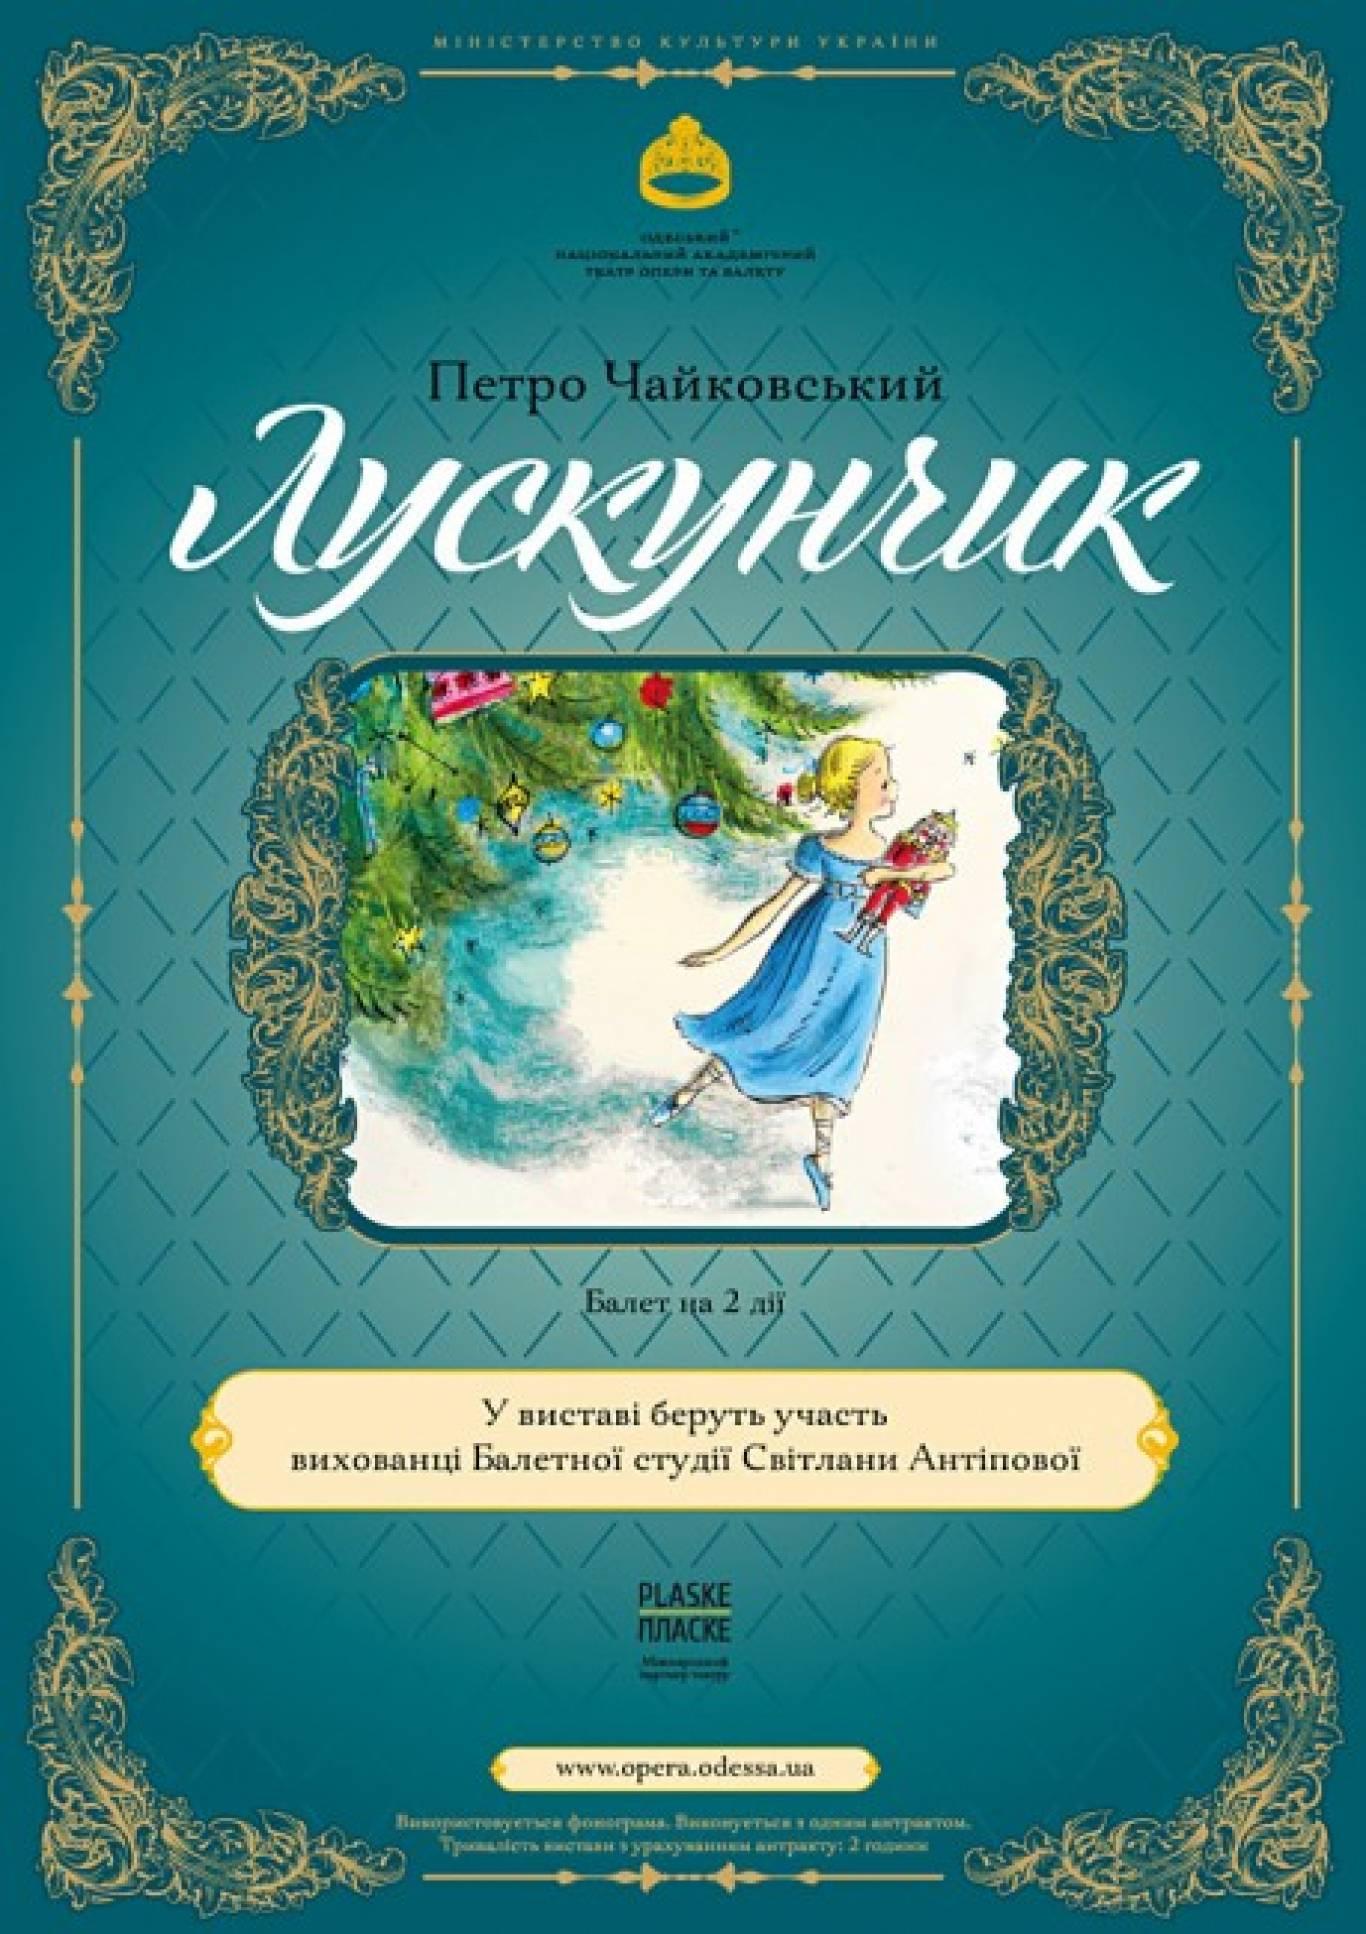 Балет «Щелкунчик» (Балетная студия С. Антиповой)